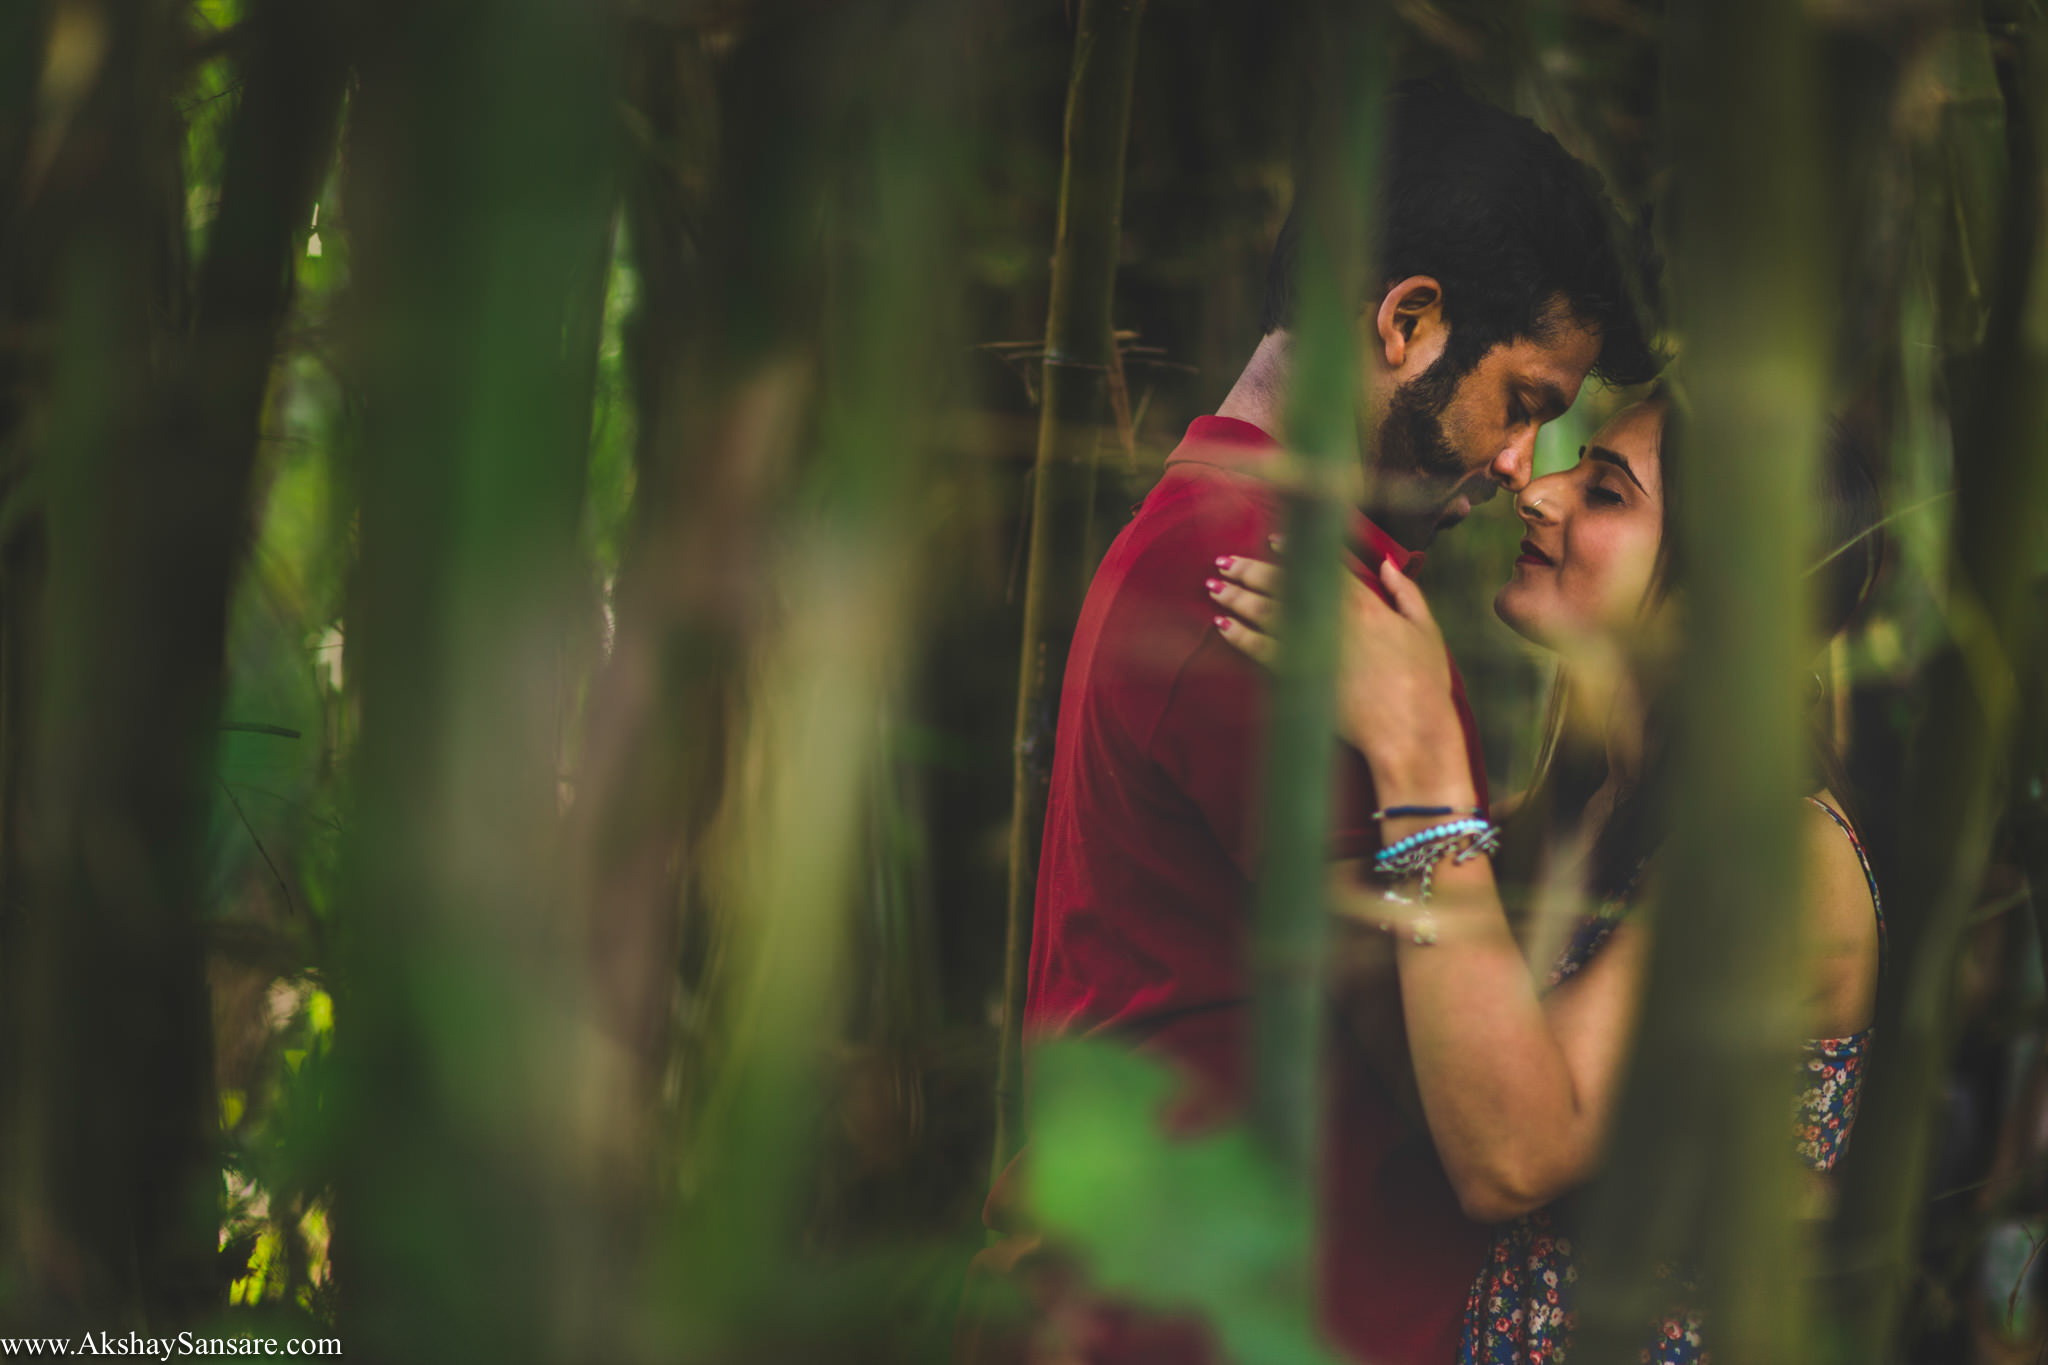 Priyanka x Sushank Pre-wedding Best Candid Photographer in Mumbai Akshay Sansare India(11).jpg